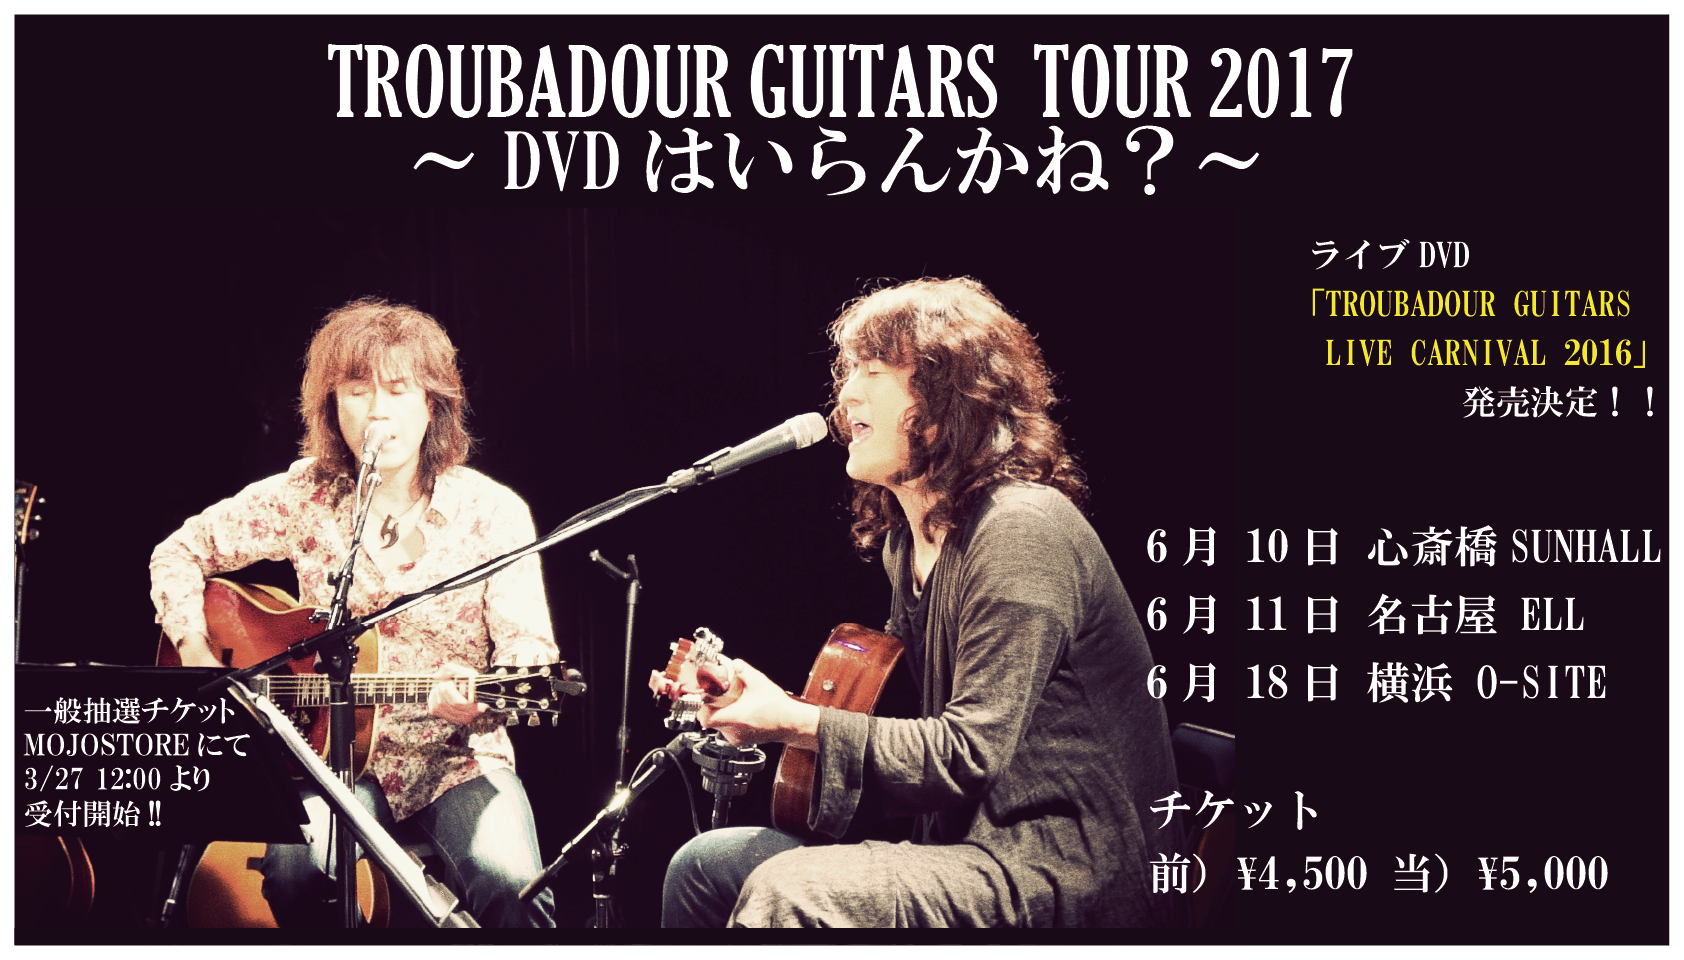 TROUBADOUR GUITARS TOUR 2017 〜DVDはいらんかね?〜